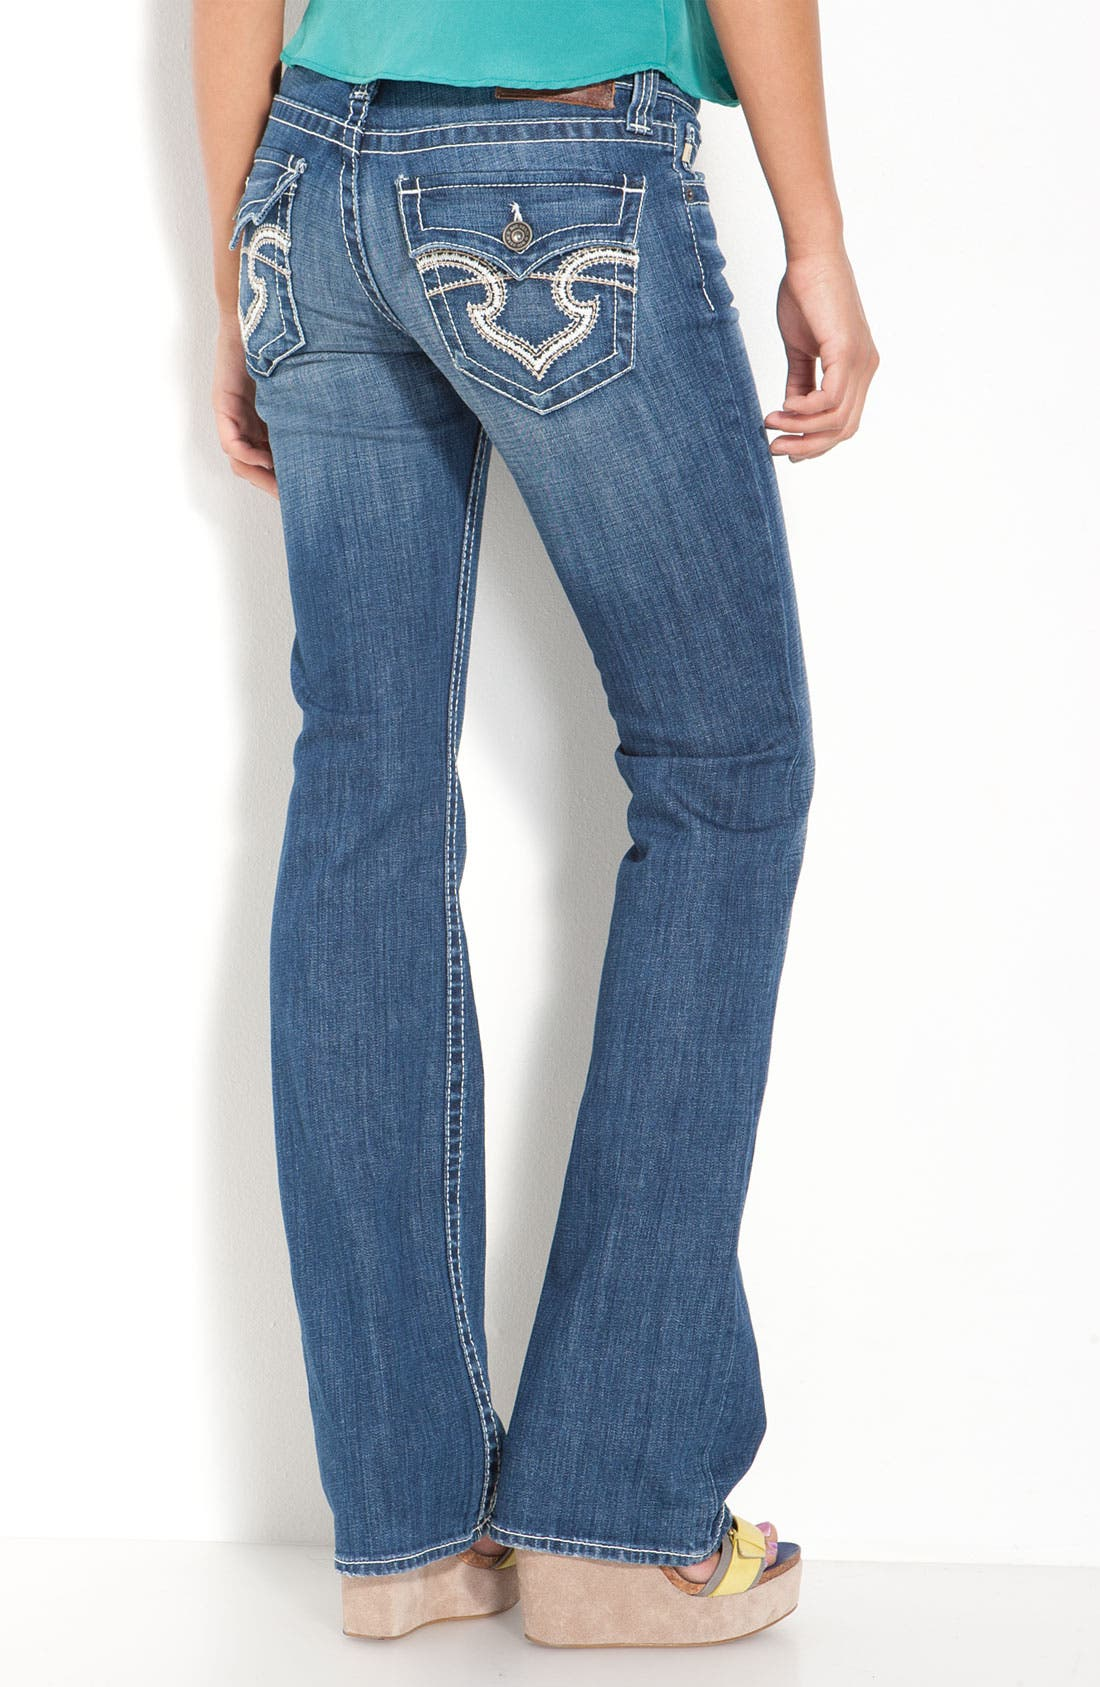 Alternate Image 1 Selected - Big Star 'Remy' Bootcut Jeans (Junction Wash) (Juniors Regular & Long)